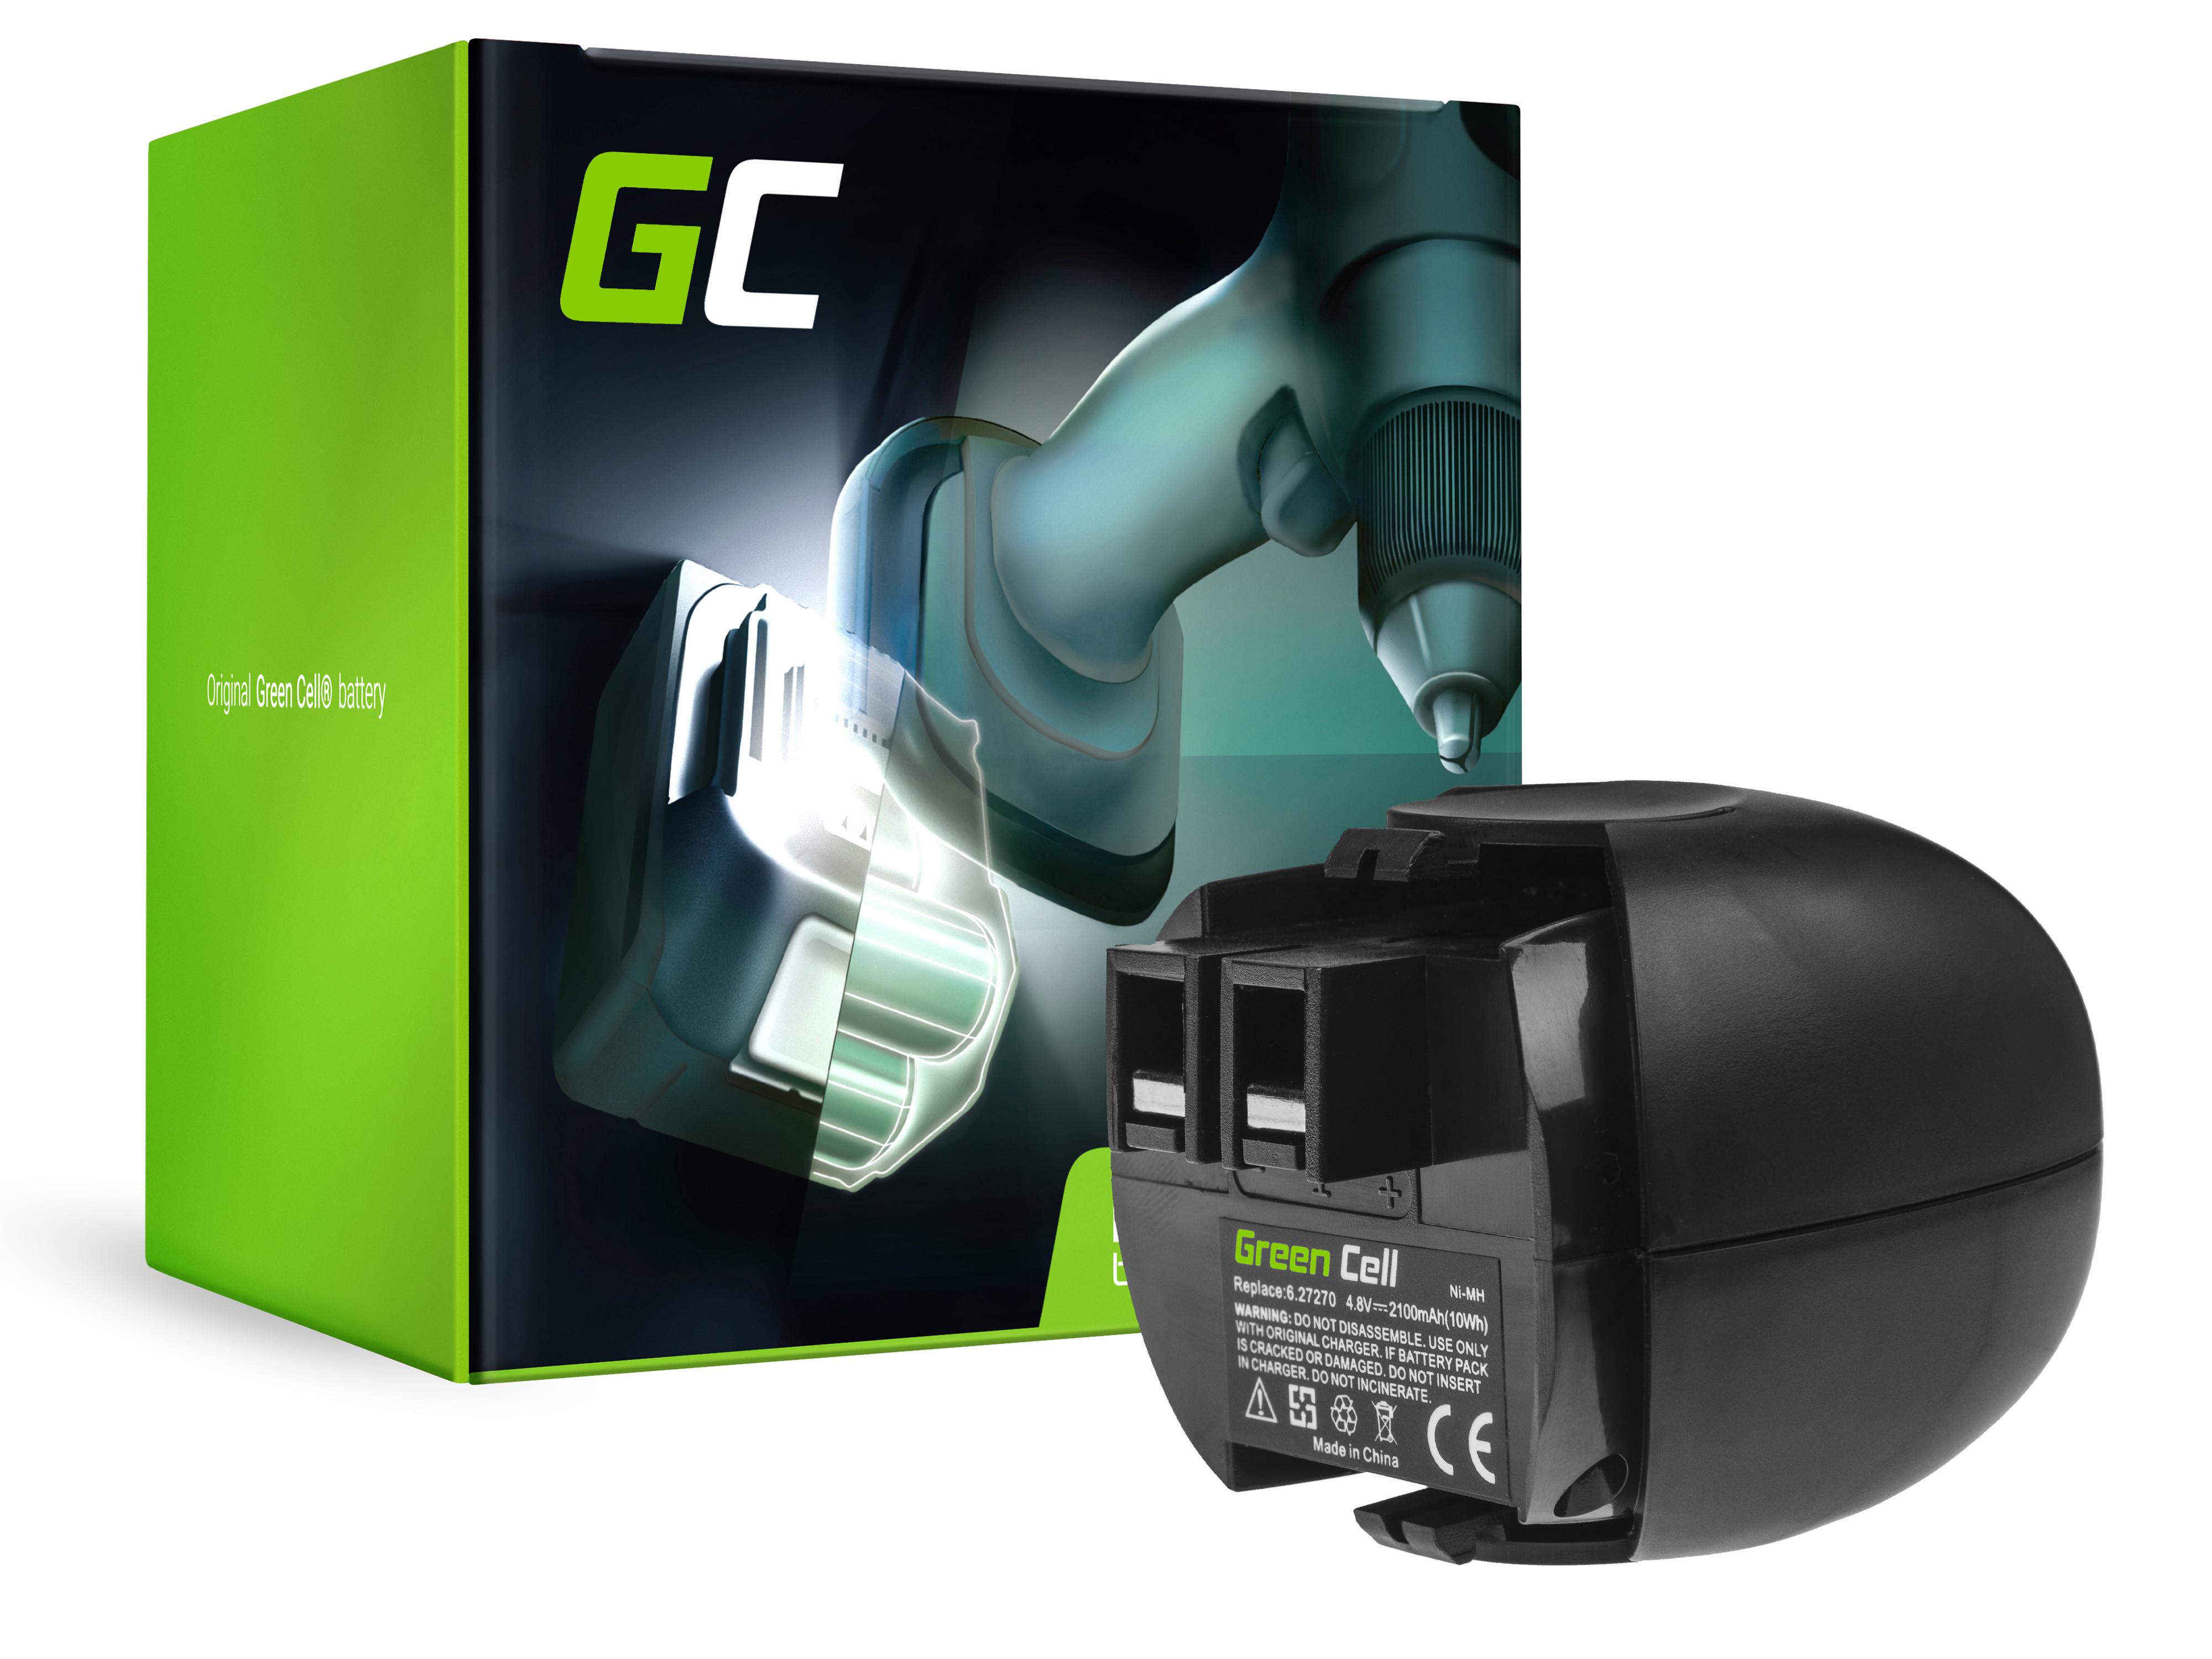 Baterie Green Cell Metabo 6.00059.5 00064000 4.8V 2100mAh Ni-MH – neoriginální